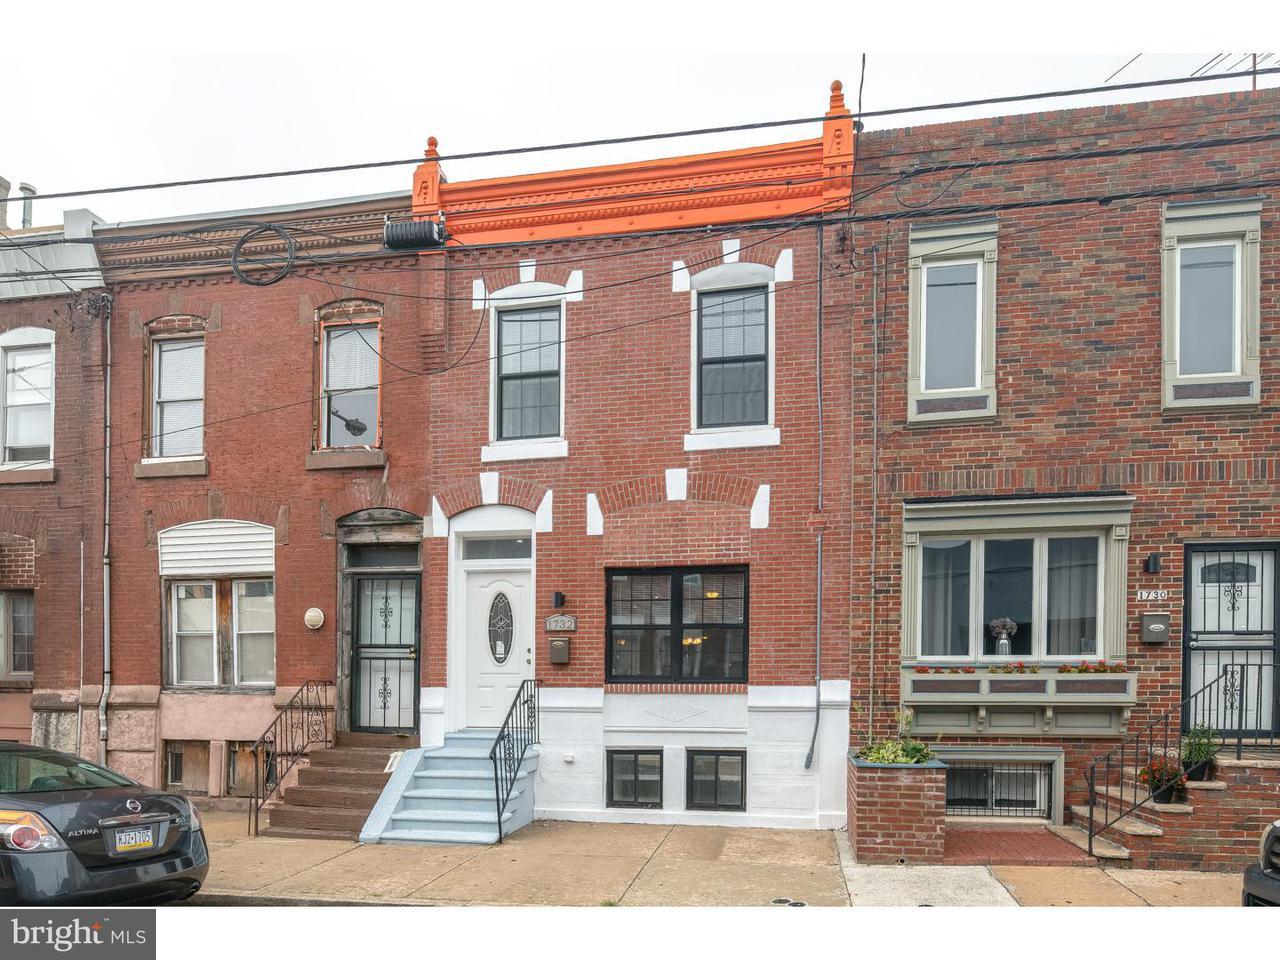 1732 S 21ST Philadelphia, PA 19145